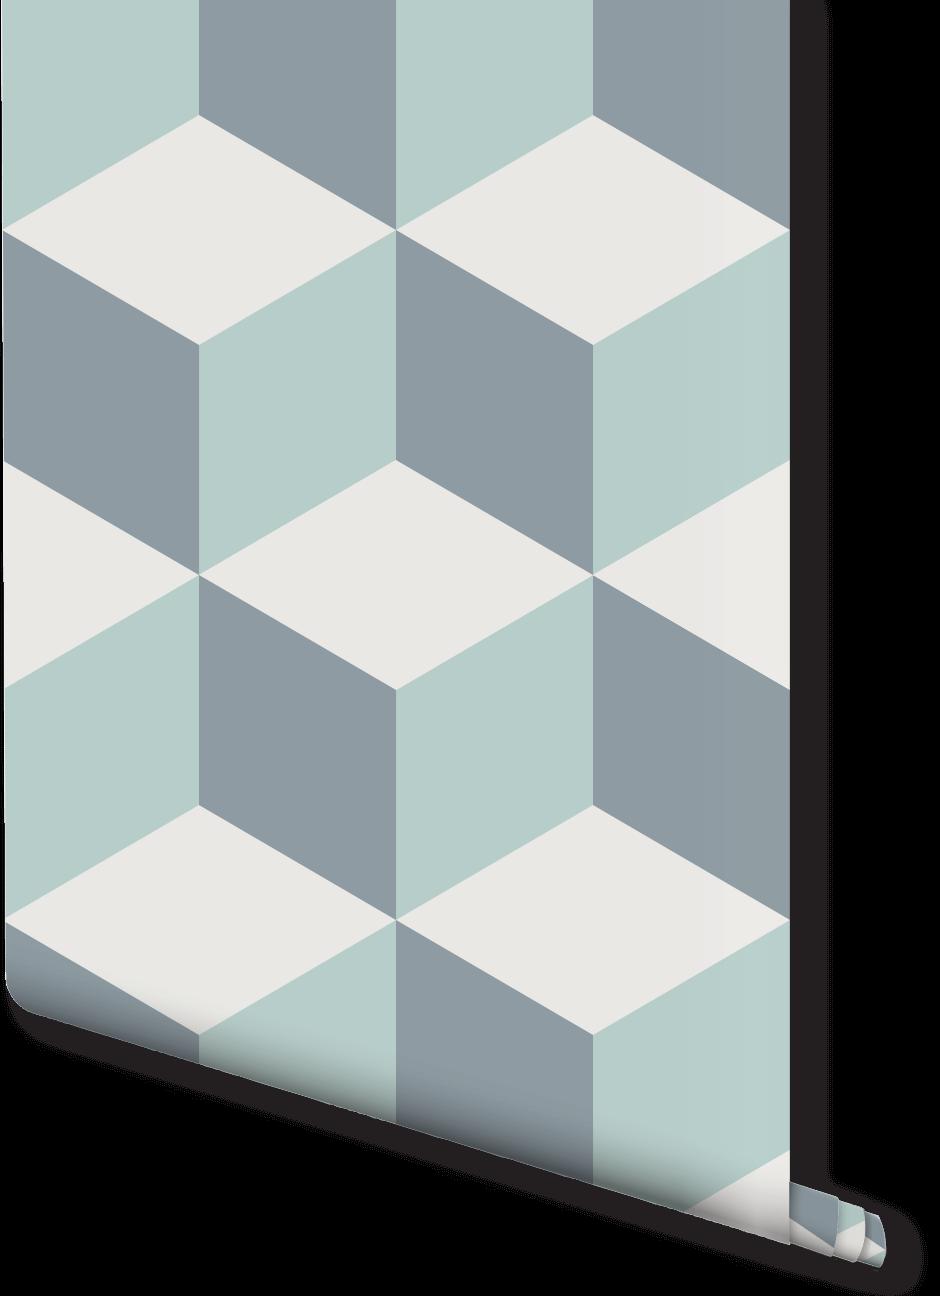 Cube clipart soft block. Large pattern wallpaper pinterest